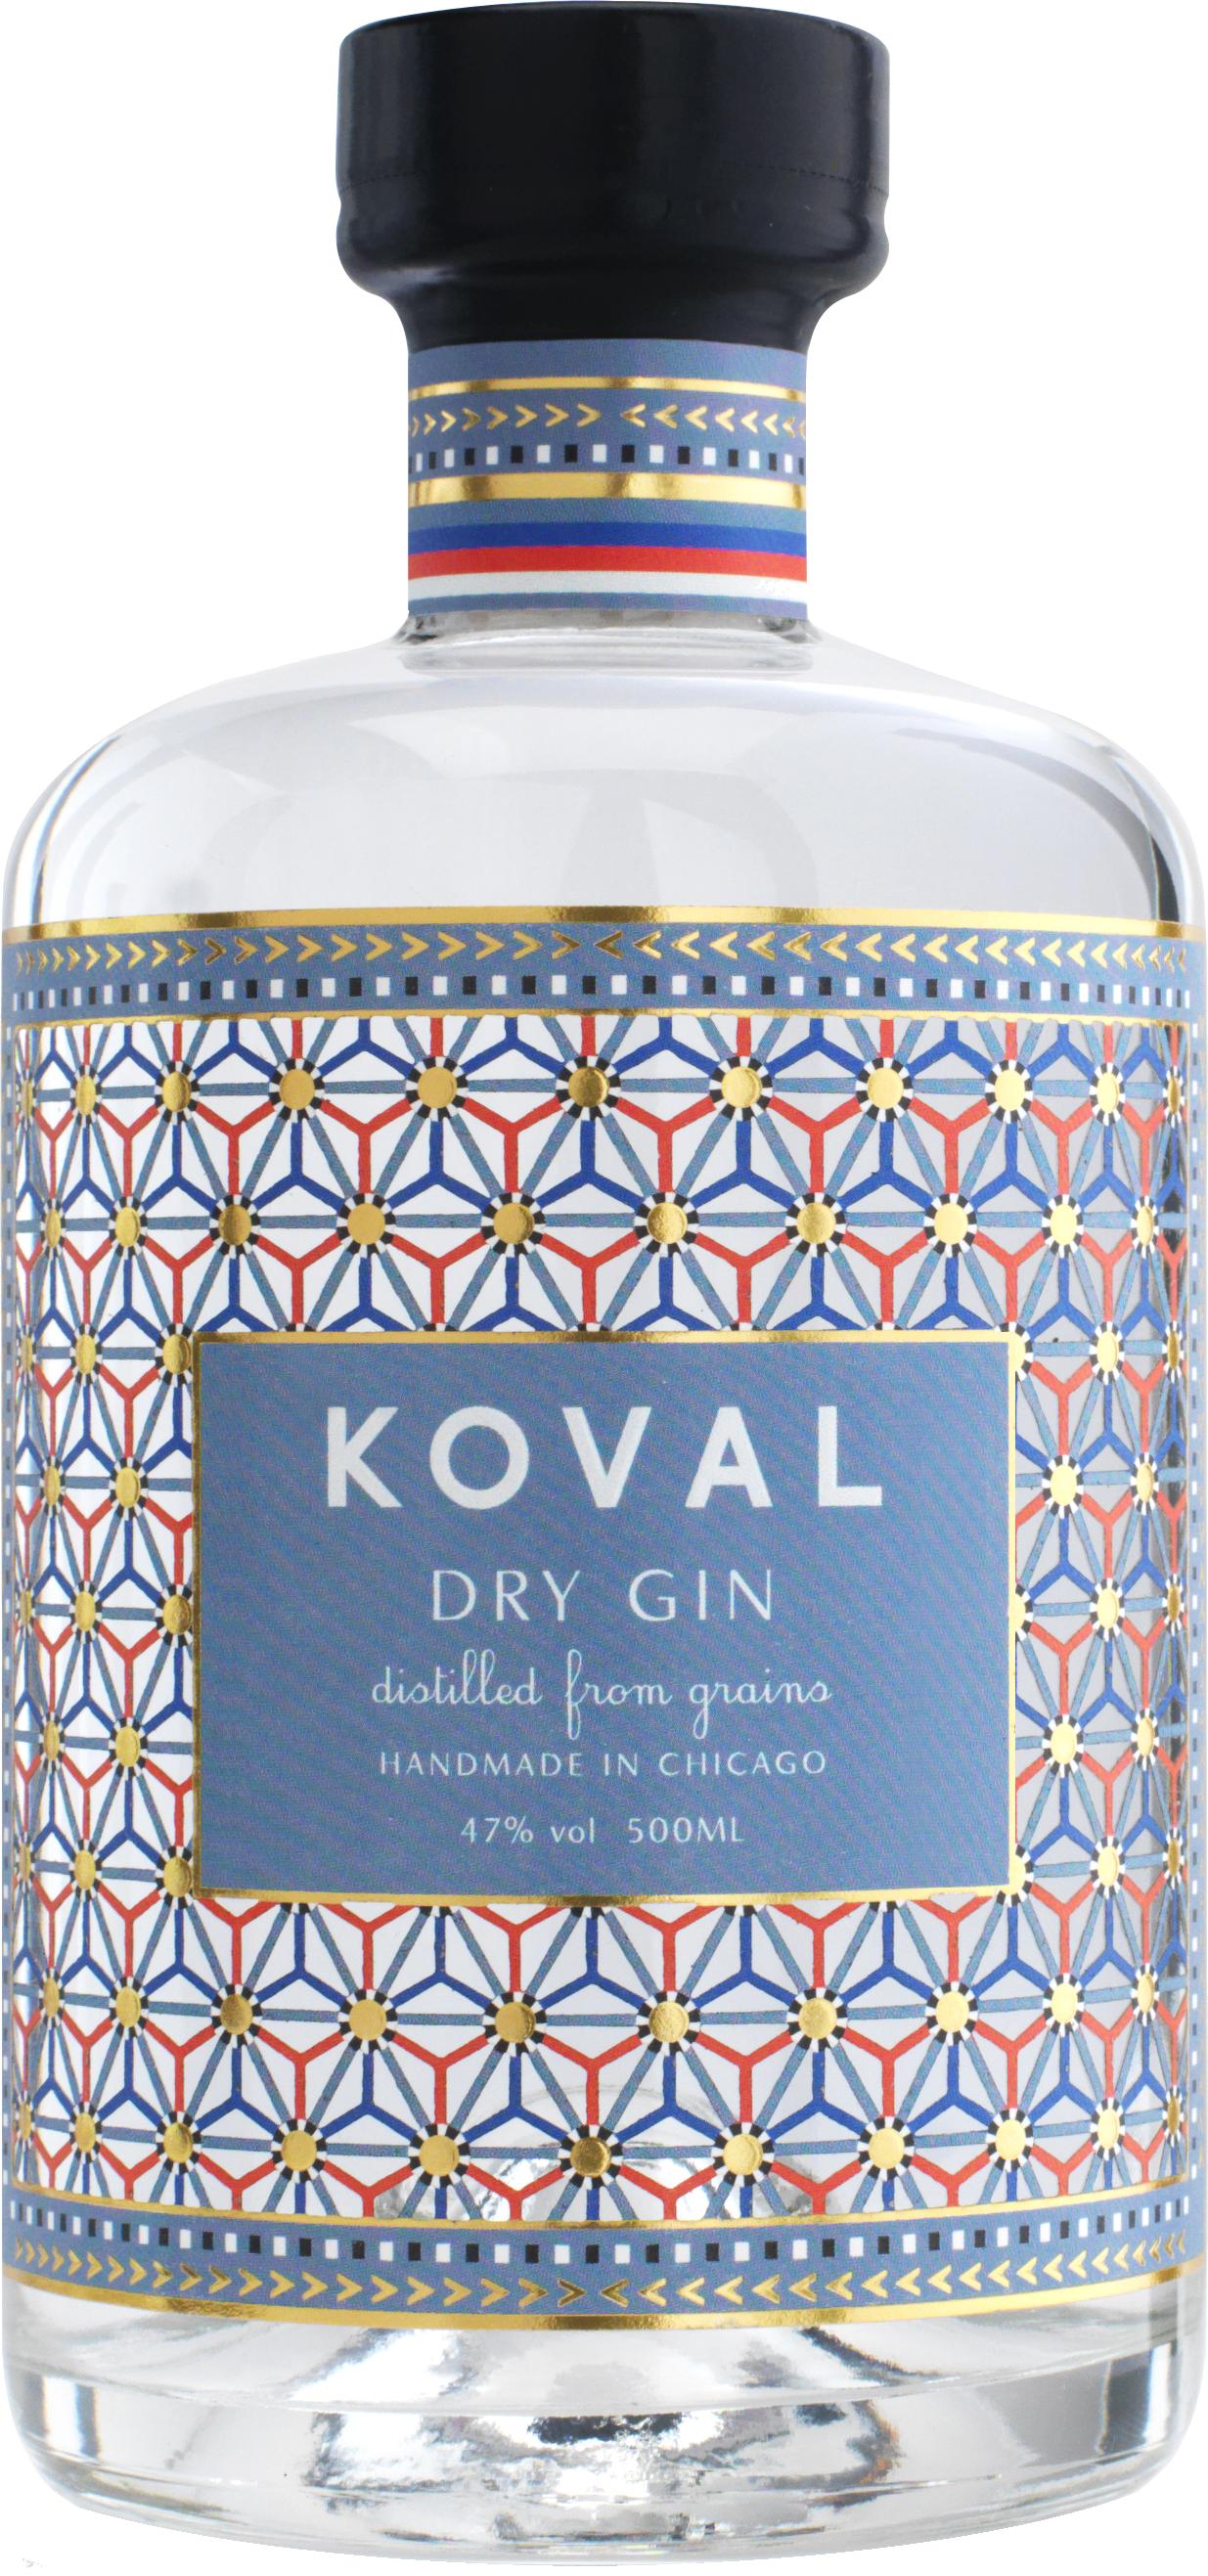 KOVAL - Dry Gin / 500mL